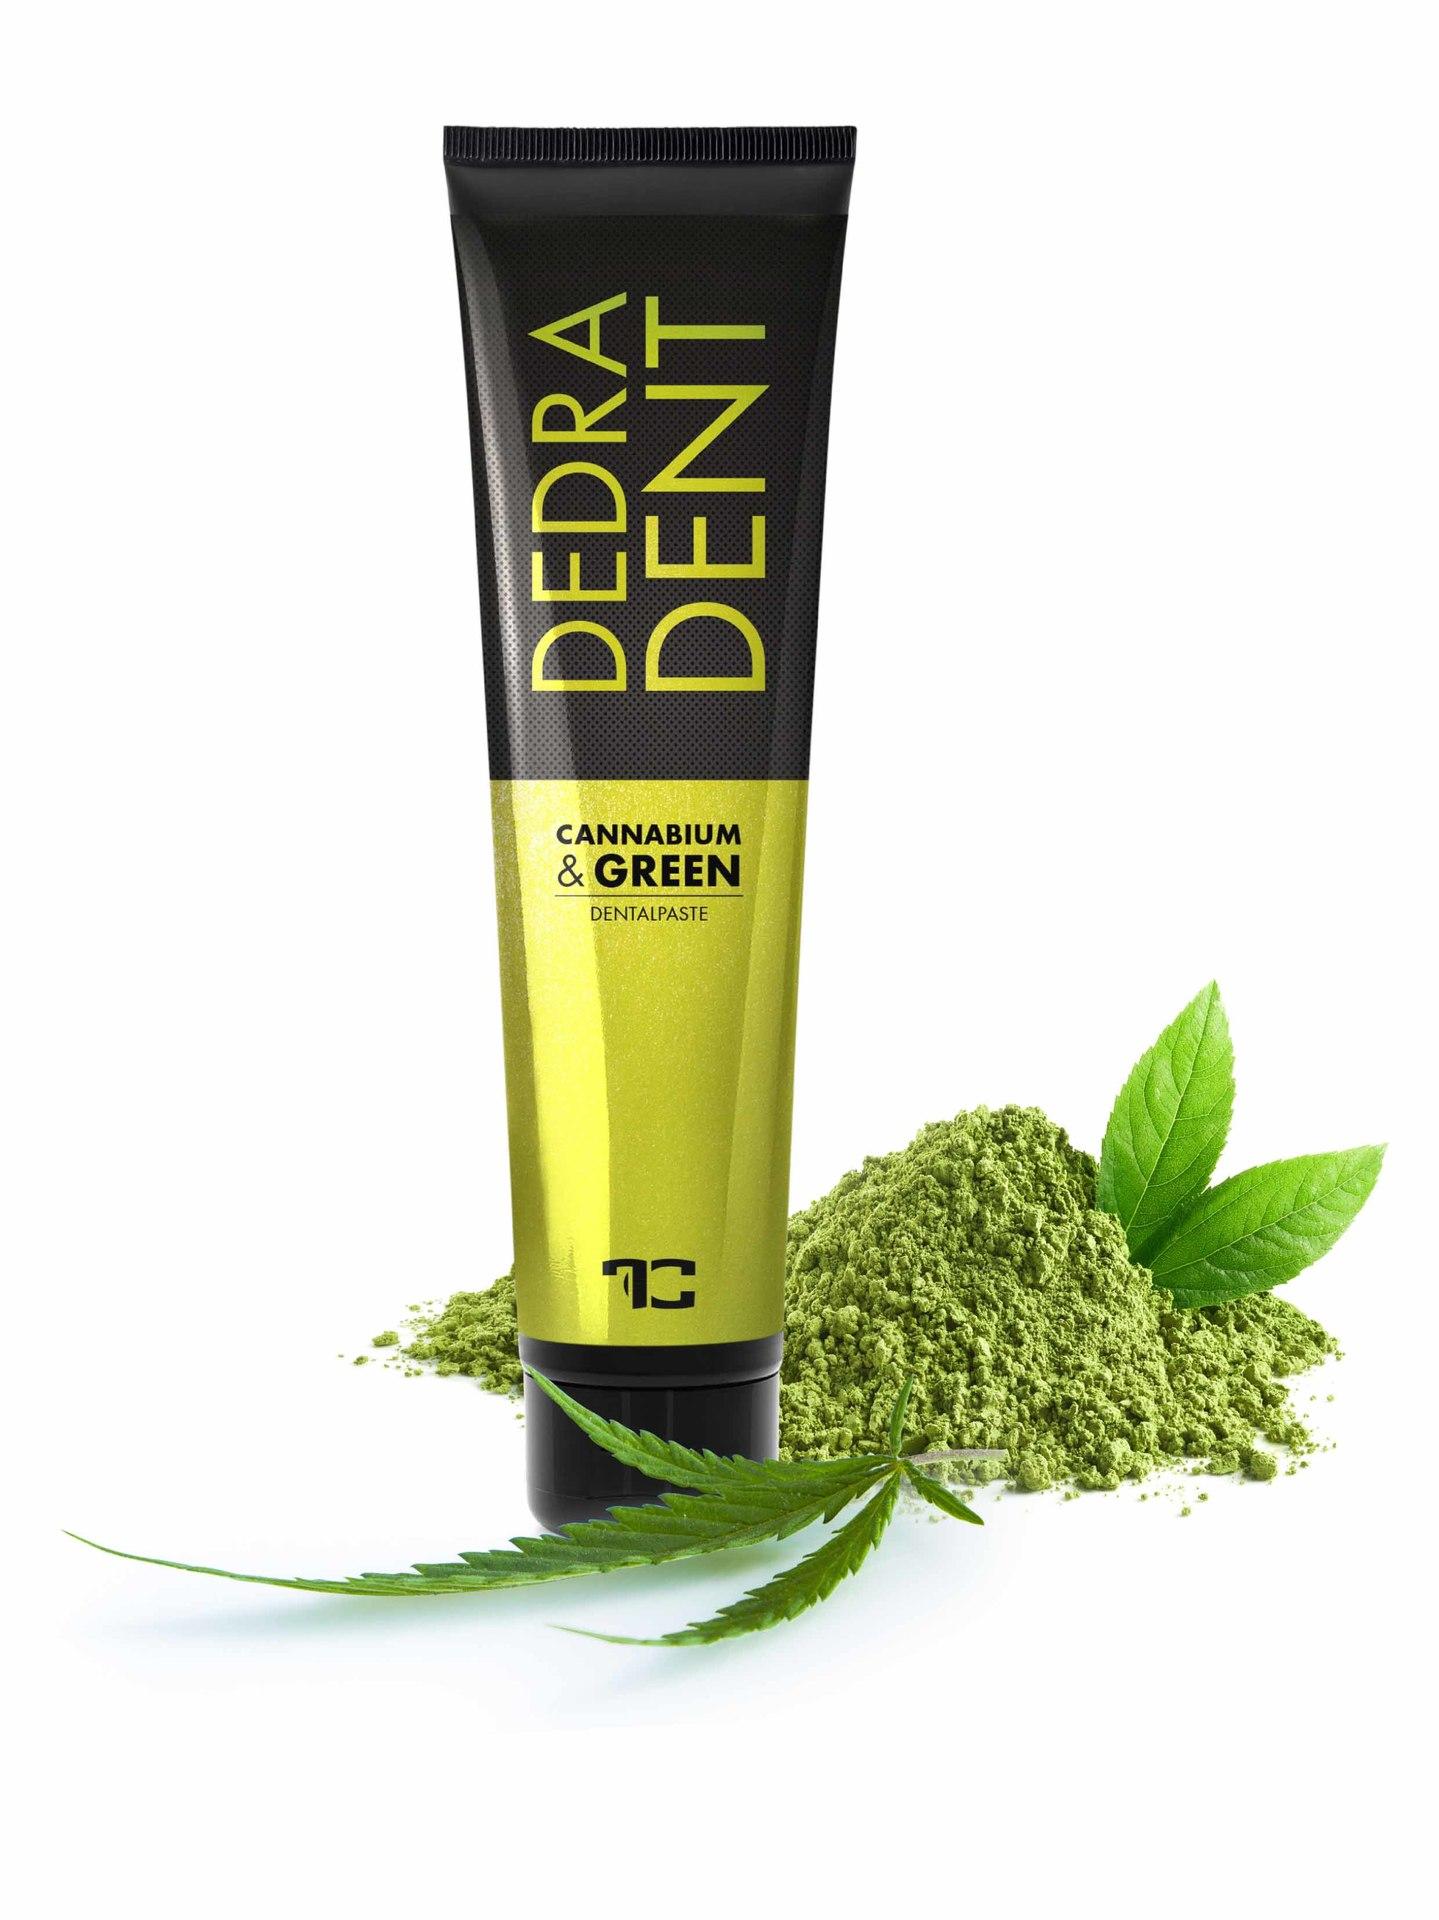 https://dedra.blob.core.windows.net/cms/ContentItems/27359_dedra-dent-bylinna-prirodni-zubni-pasta-cannabium-a-green-s-konopnym-olejem-zelenym-jecmenem-a-extraktem-ze-zeleneho-caje-matcha/images/fc25722-001.jpg